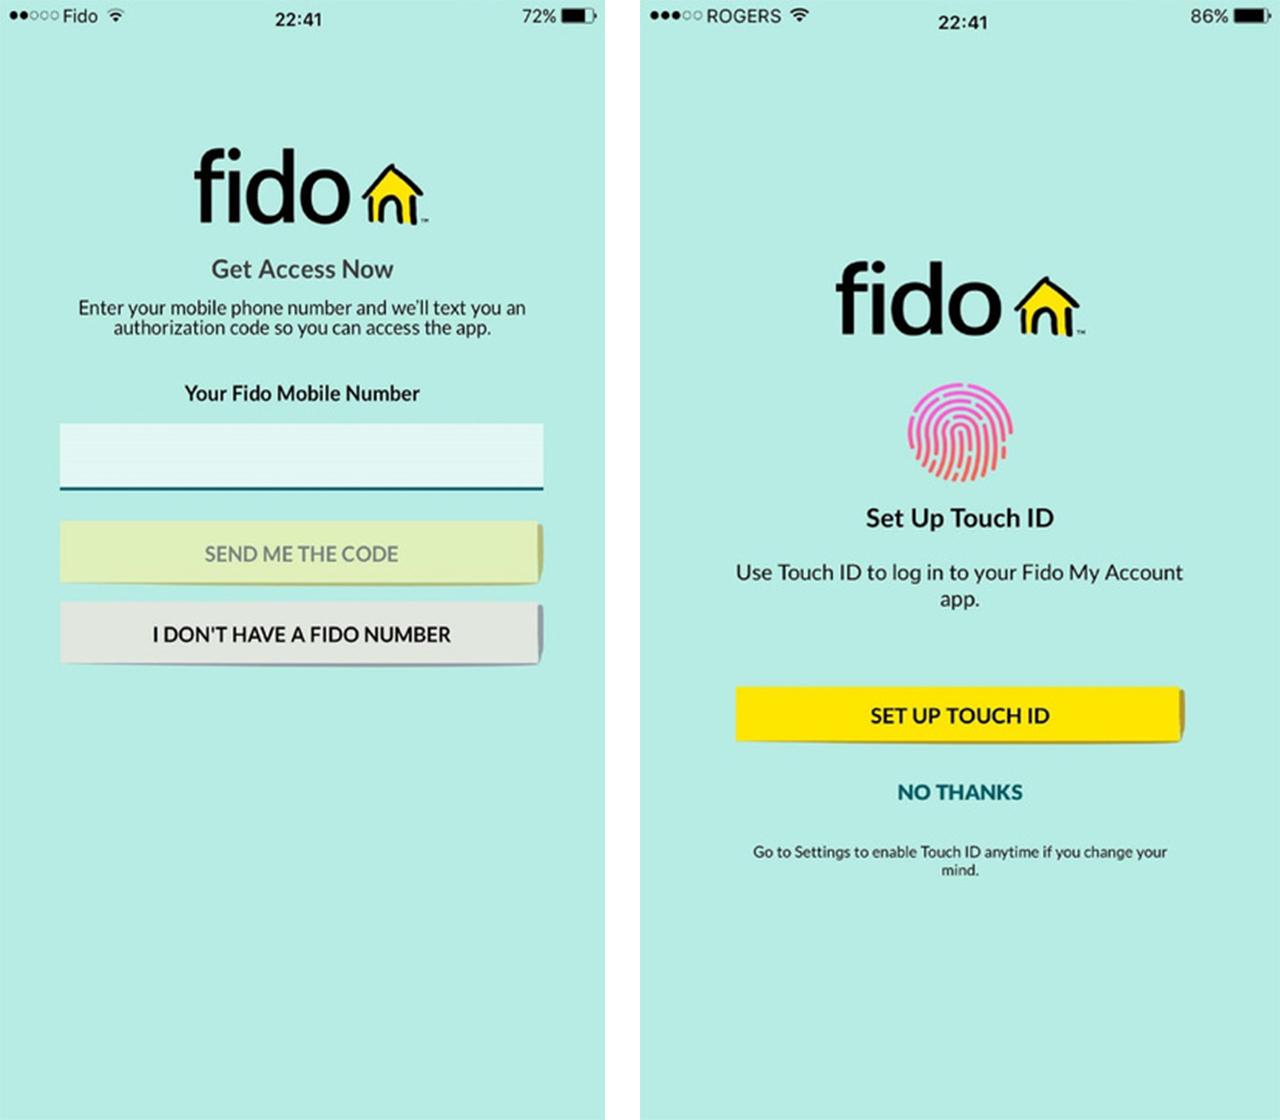 Updated Fido My Account App